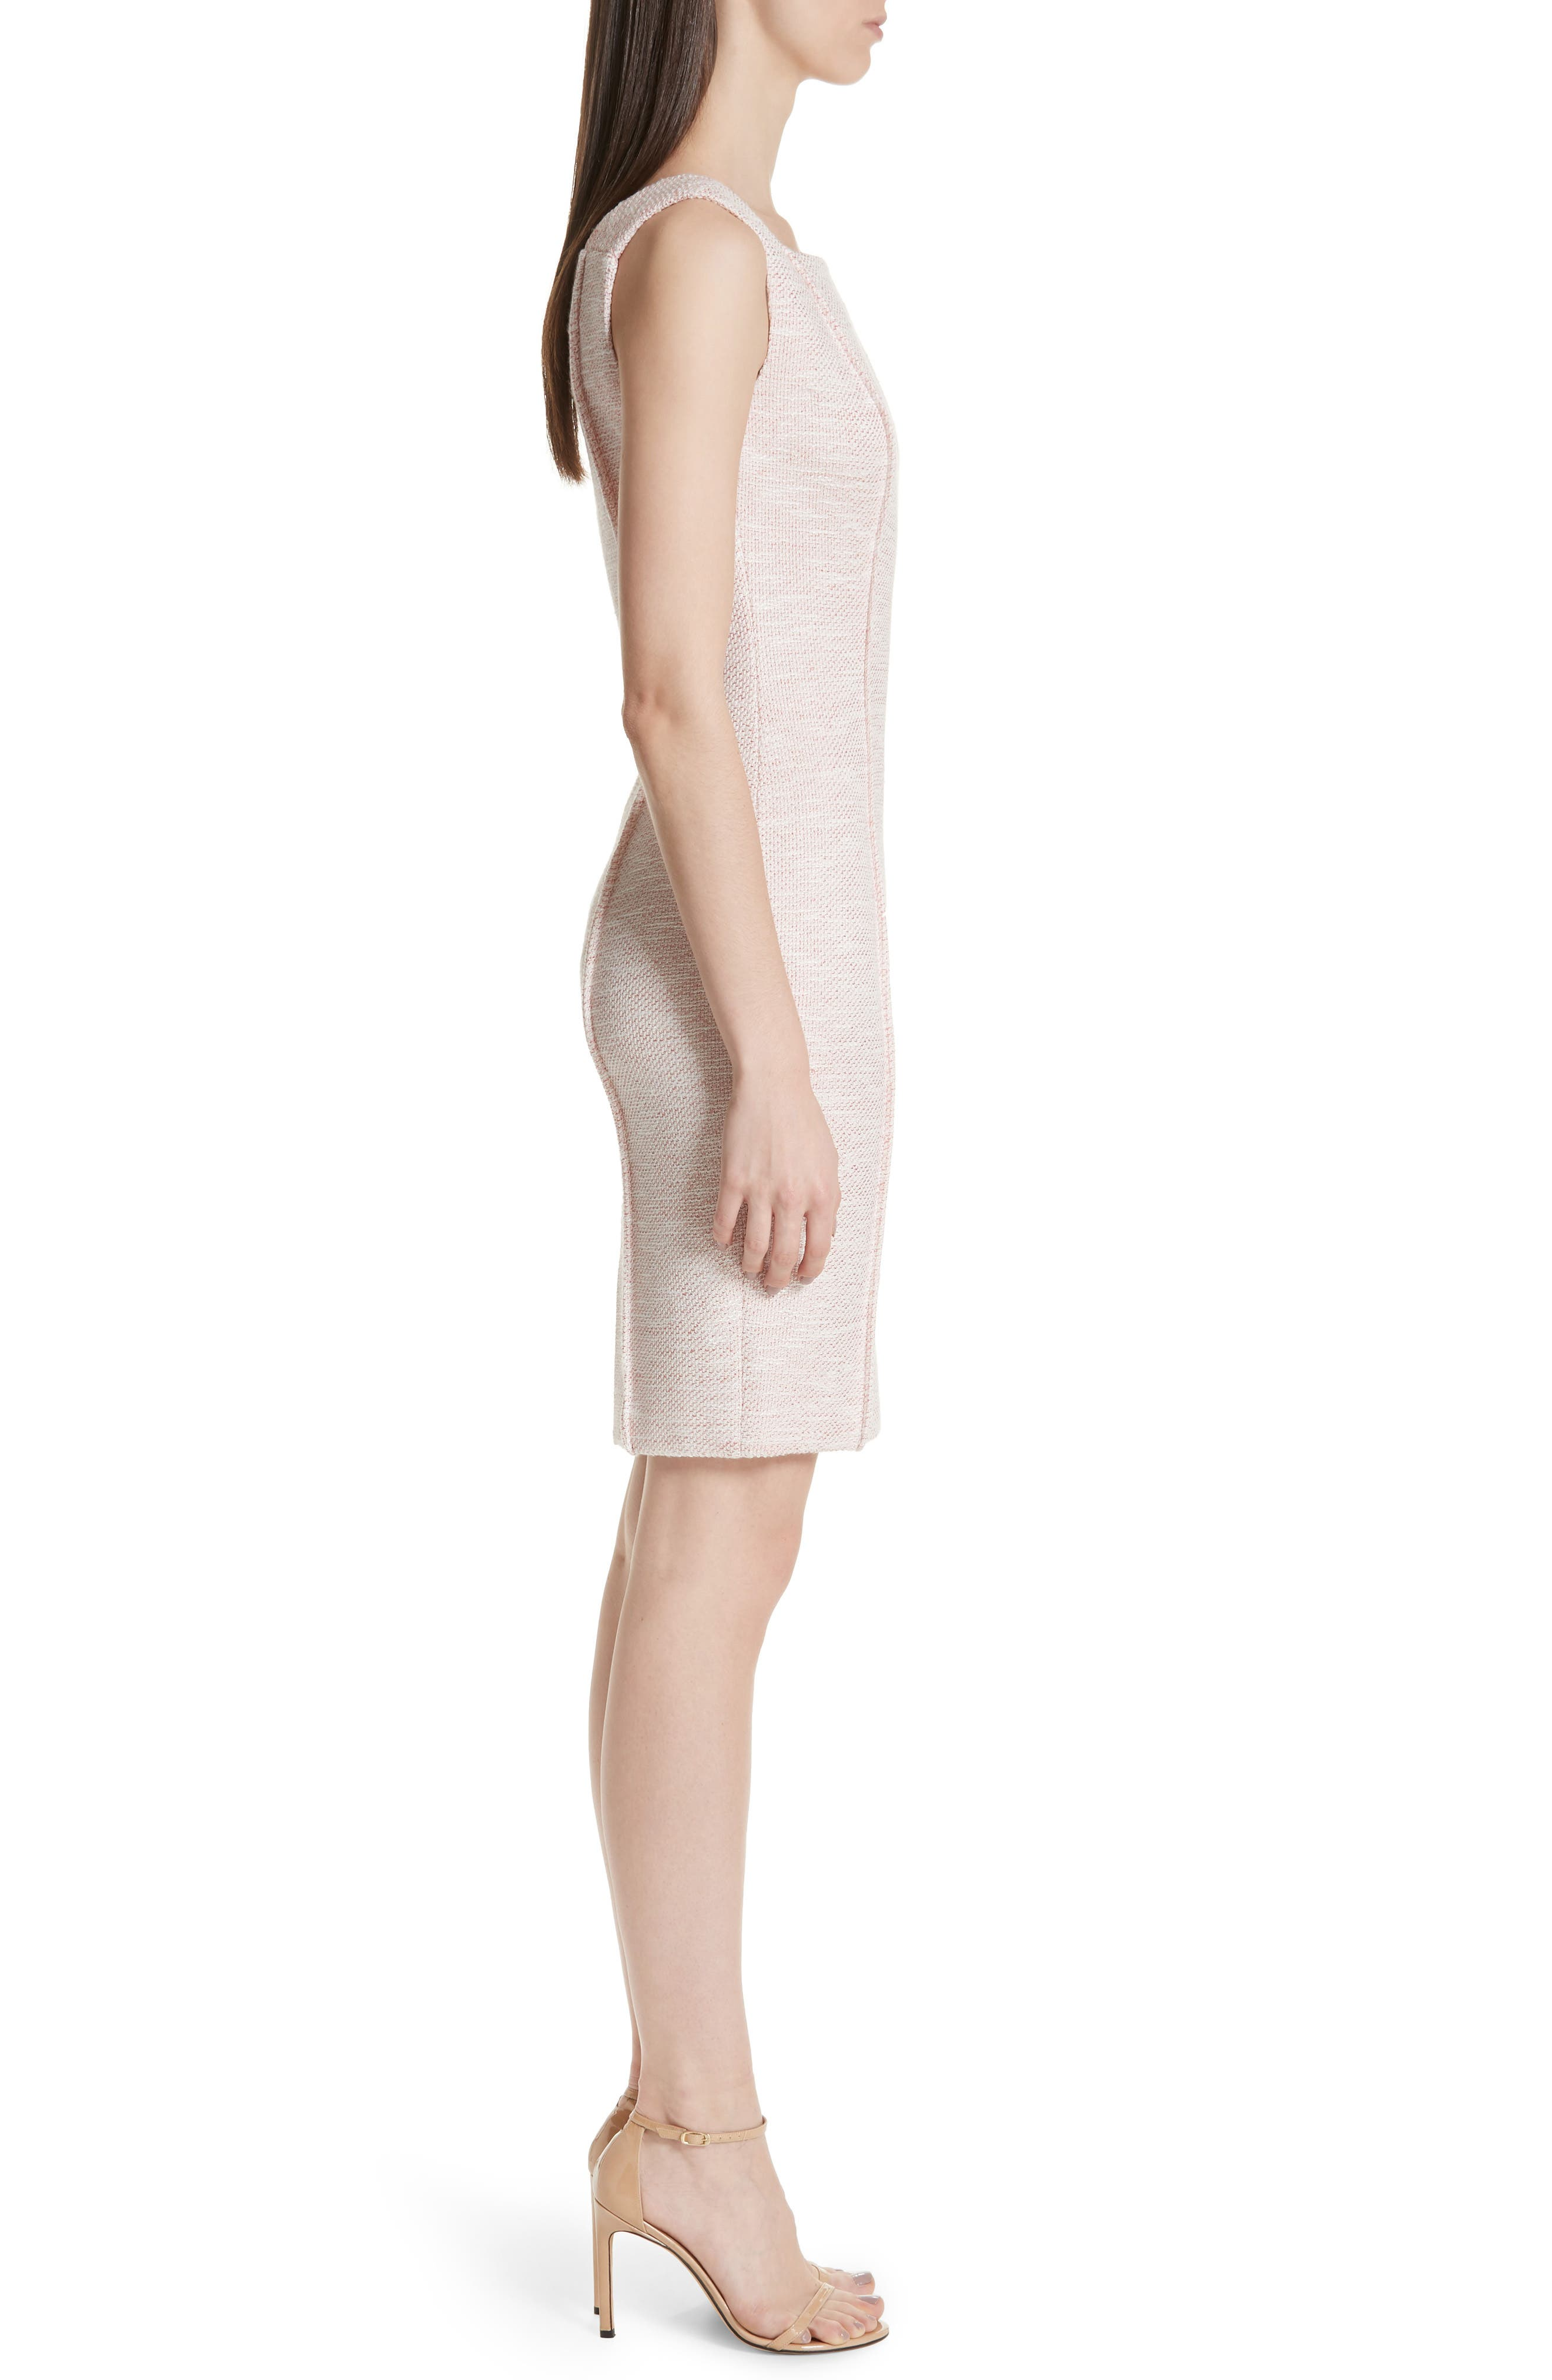 ST. JOHN COLLECTION, Belinda Knit Square Neck Dress, Alternate thumbnail 3, color, WHITE/ CORAL MULTI